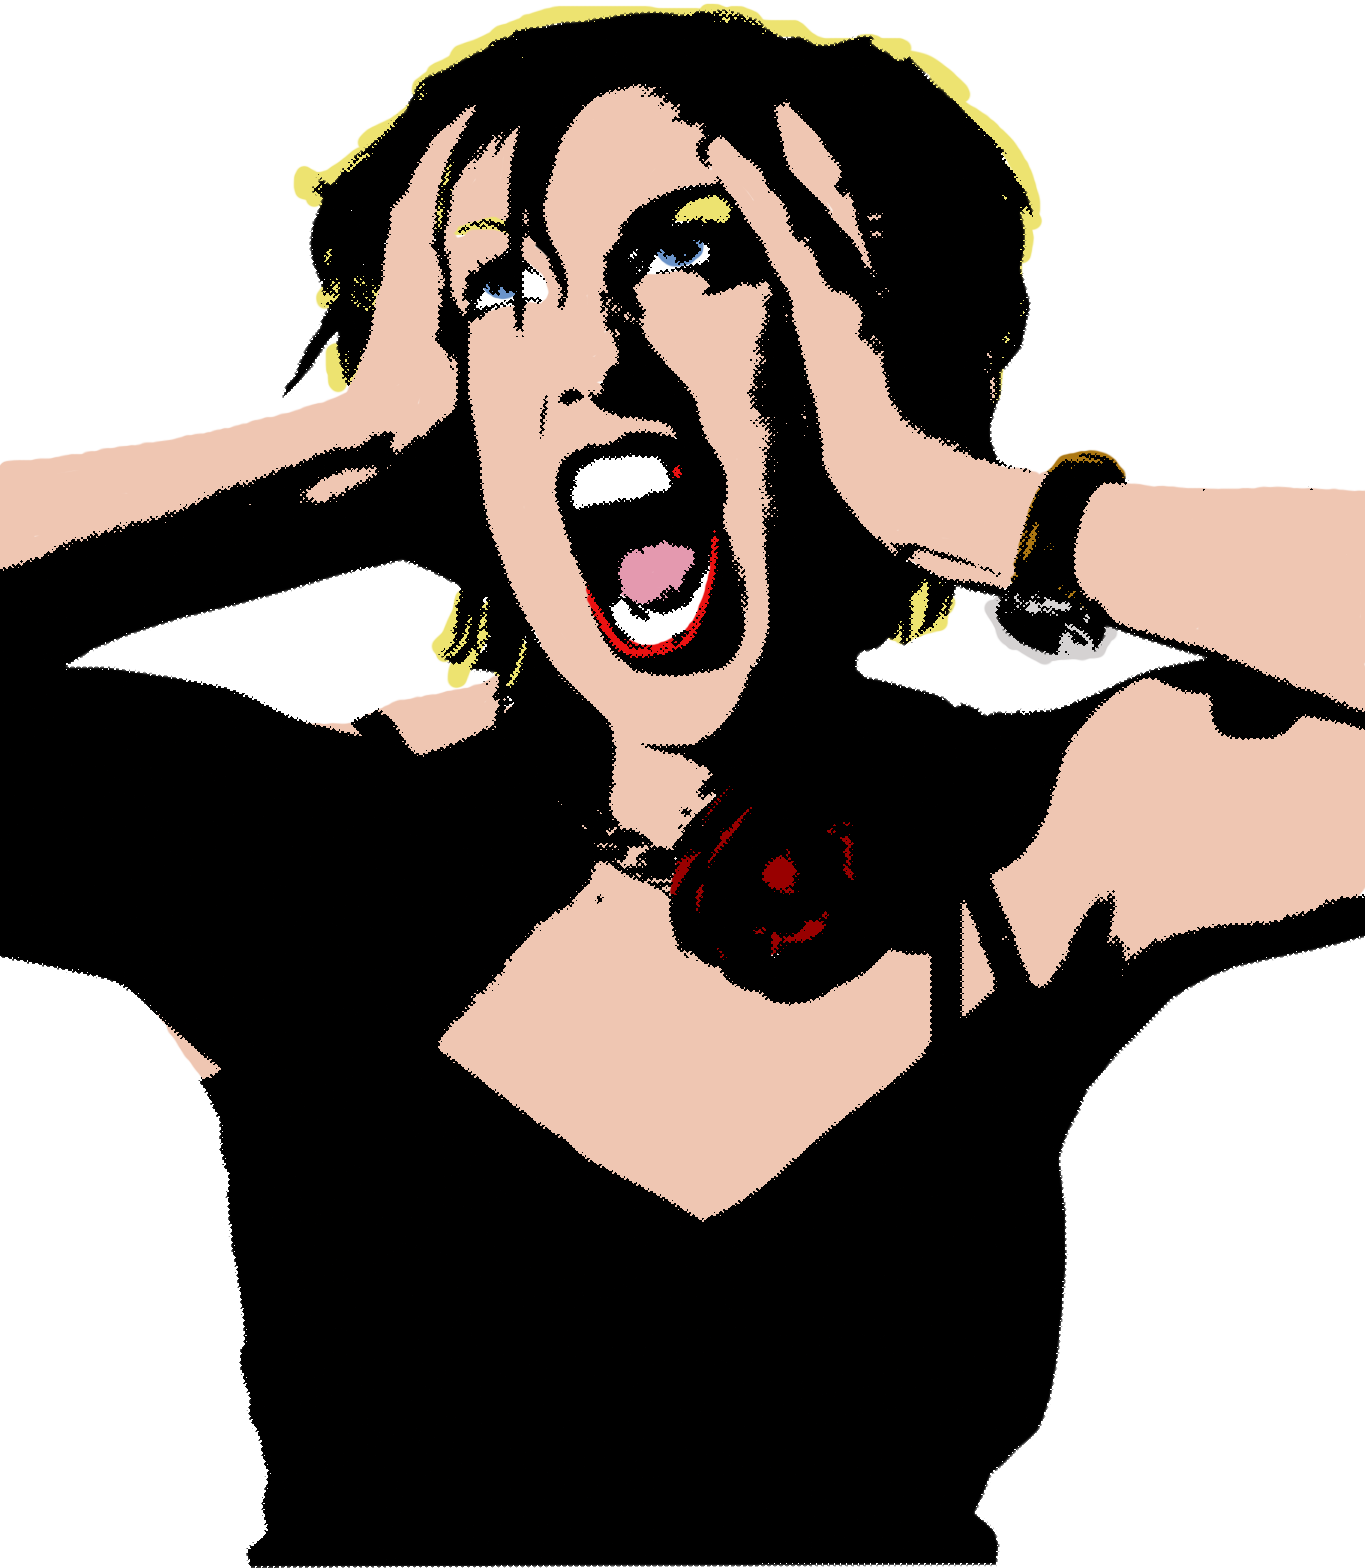 Yelling clipart woman scream, Yelling woman scream.